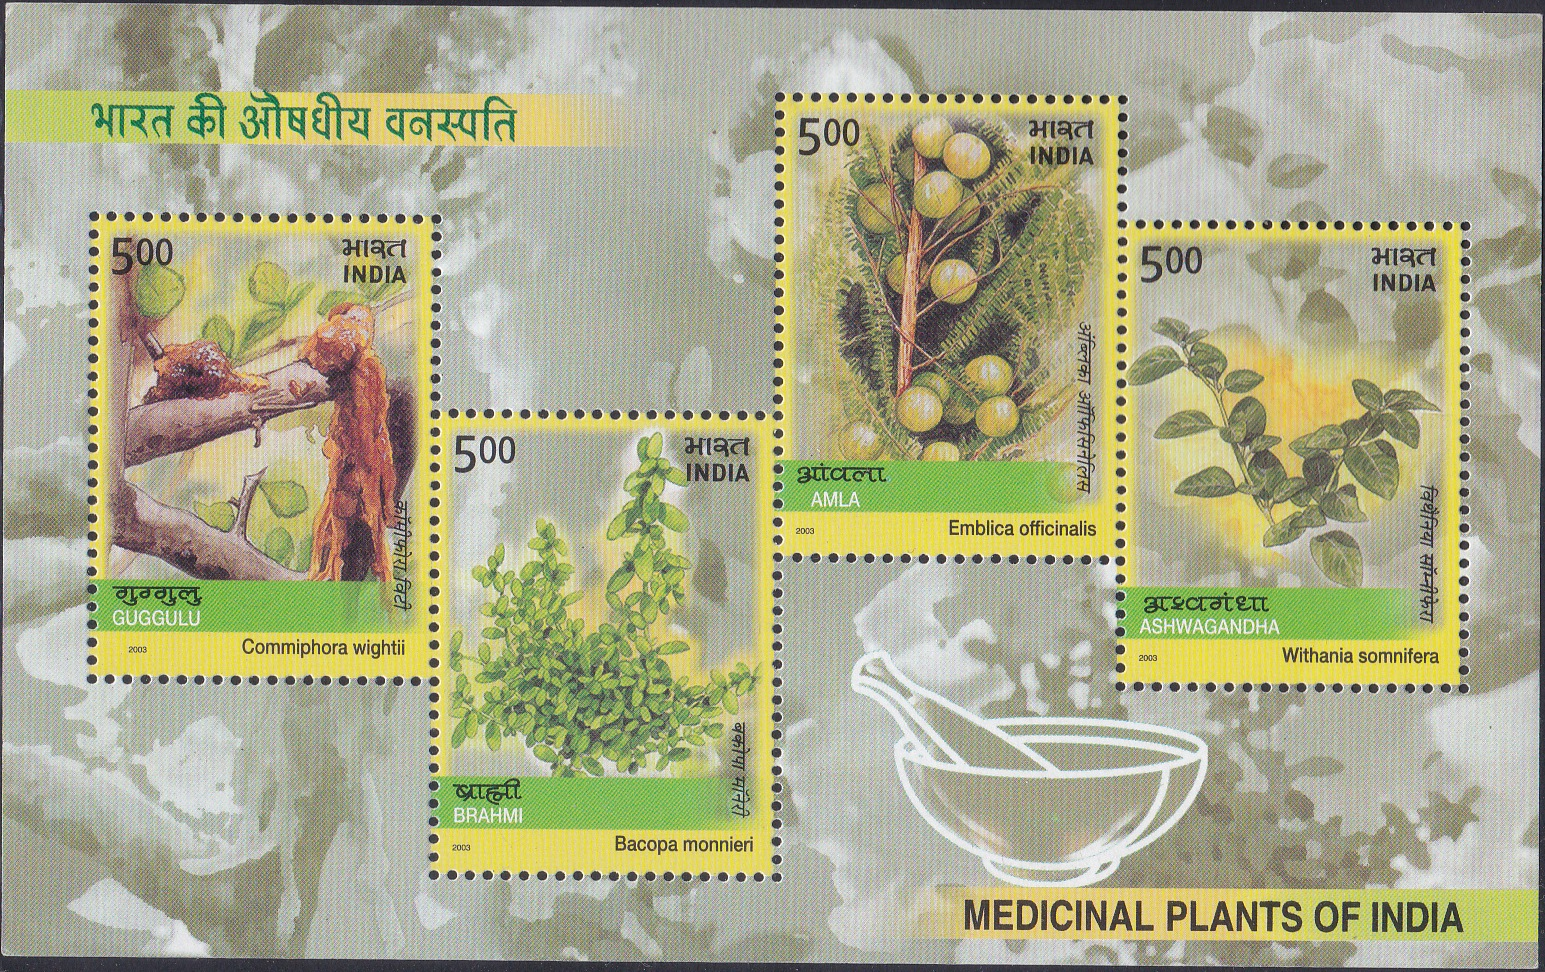 Indian Medicinal Plants (Ayurveda)